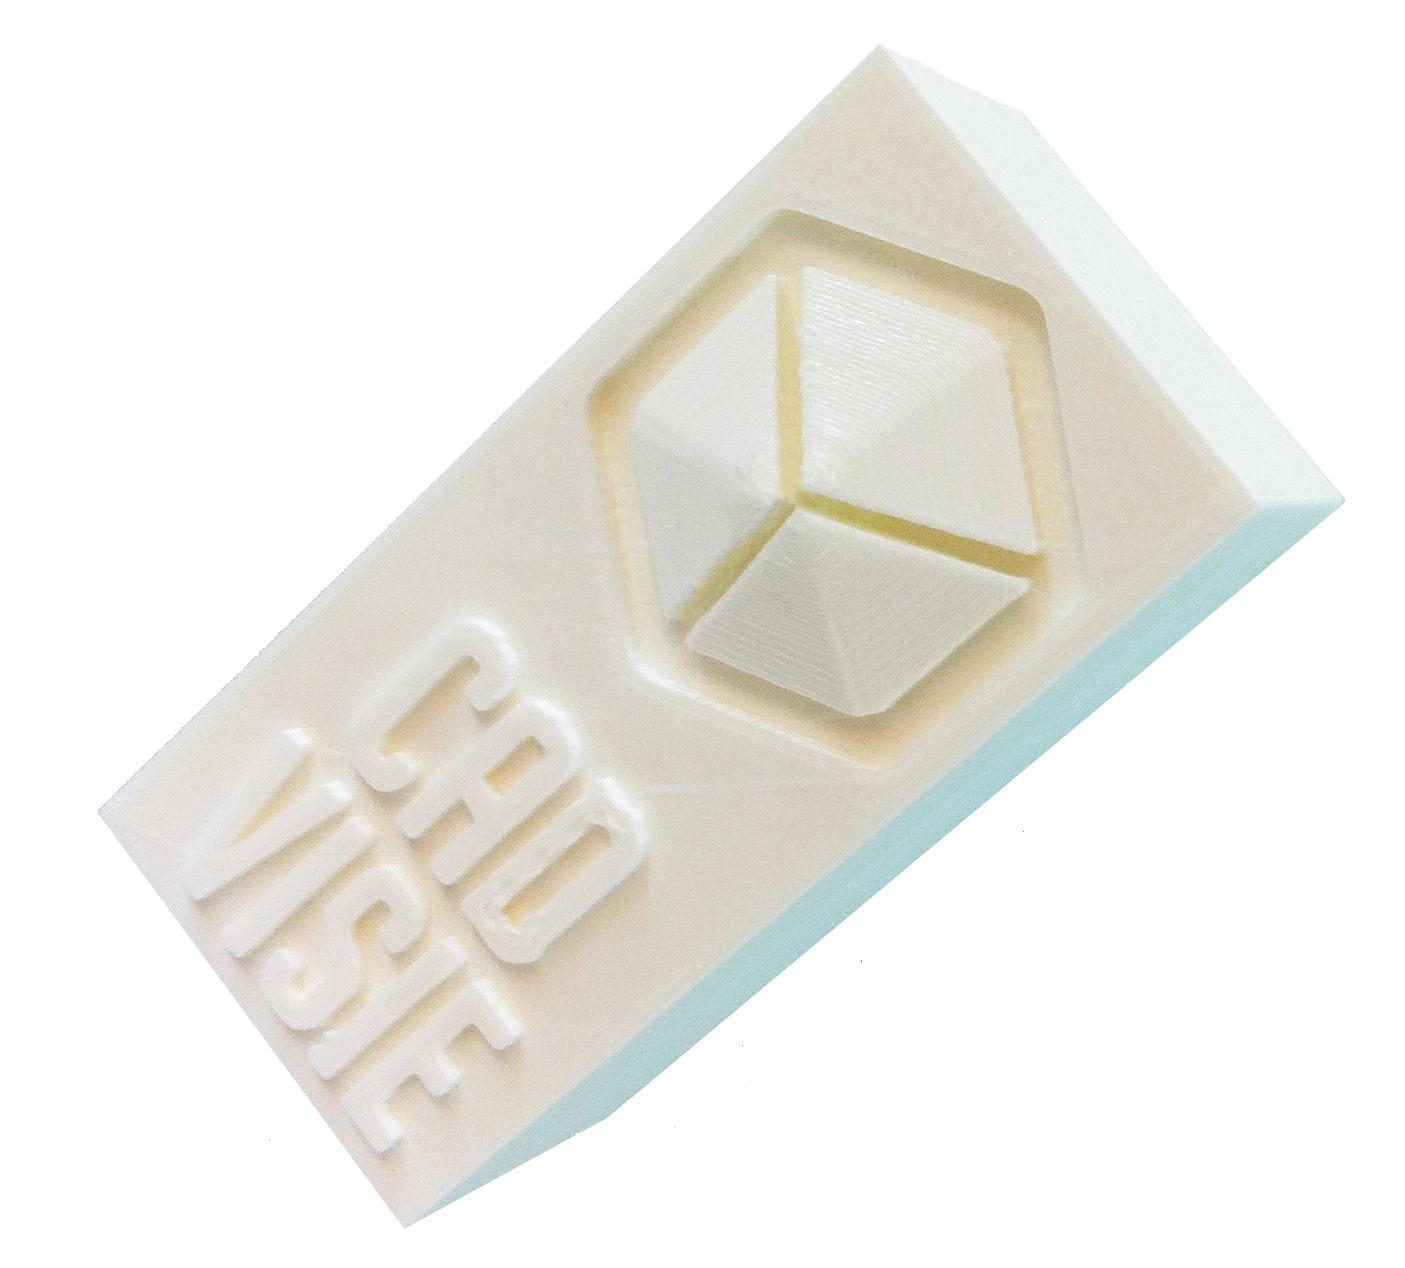 CAD Visie 3D printen